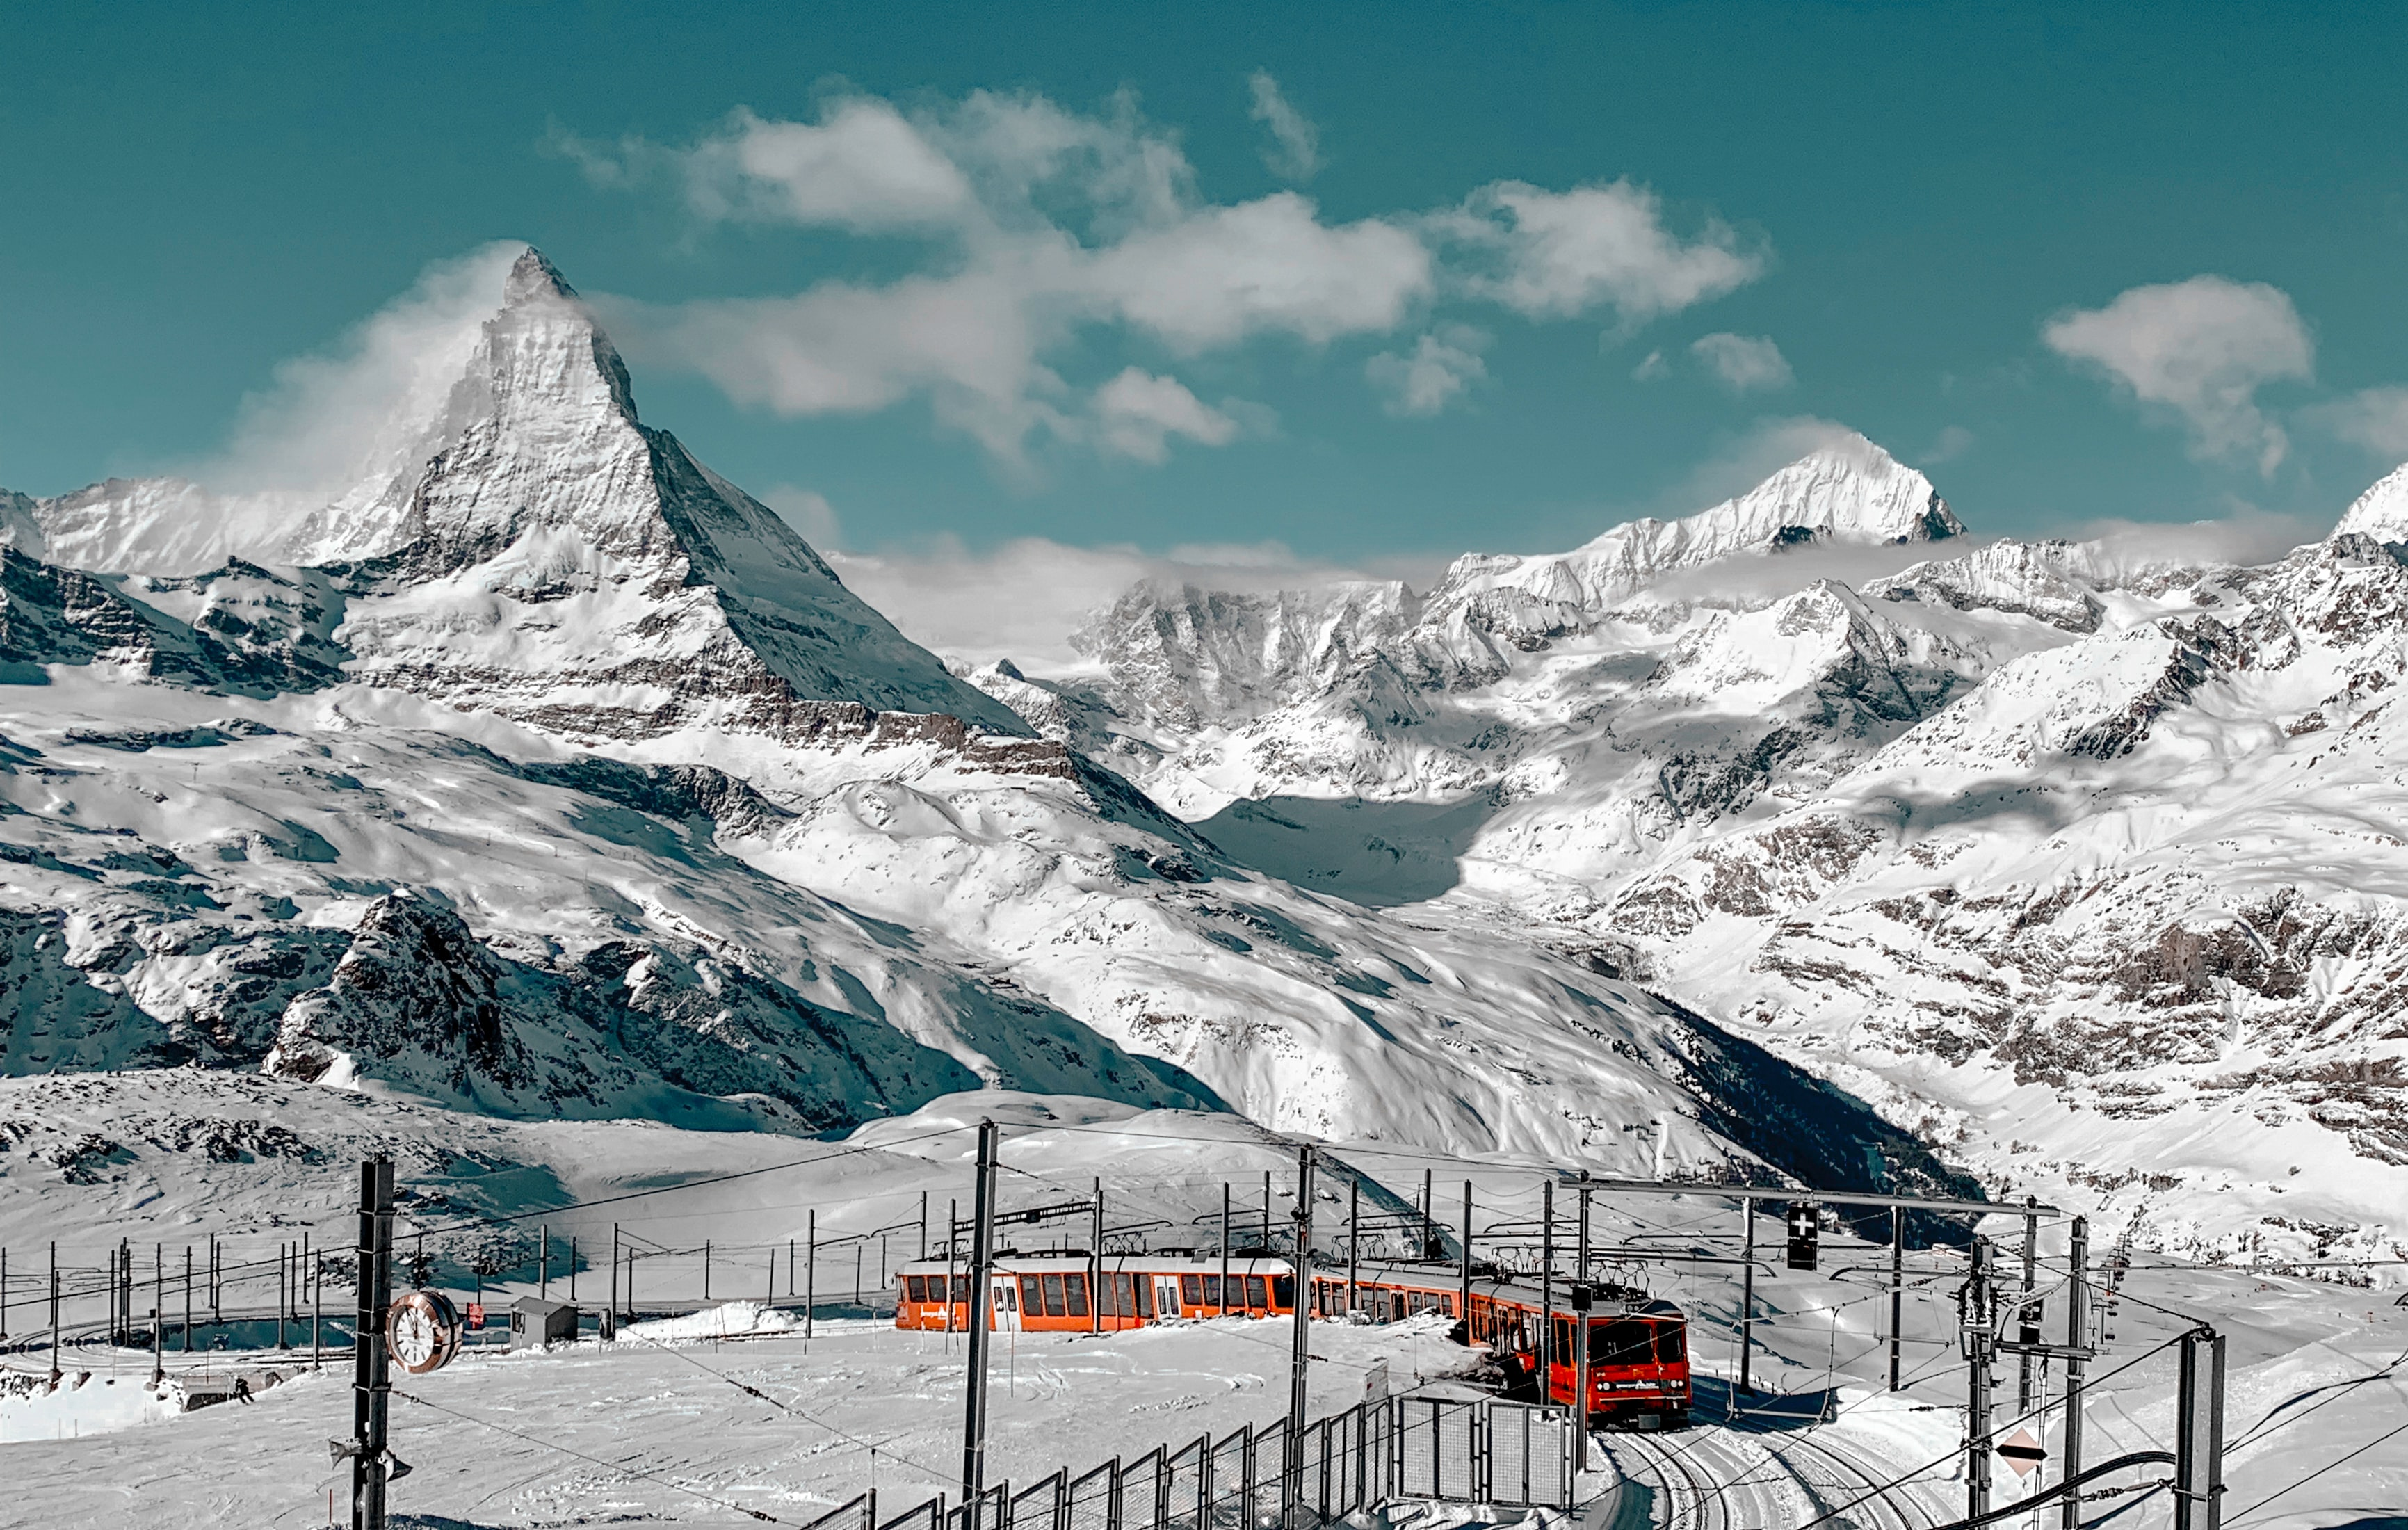 Give a try to climb Matterhorn Glacier Paradise-Zermatt